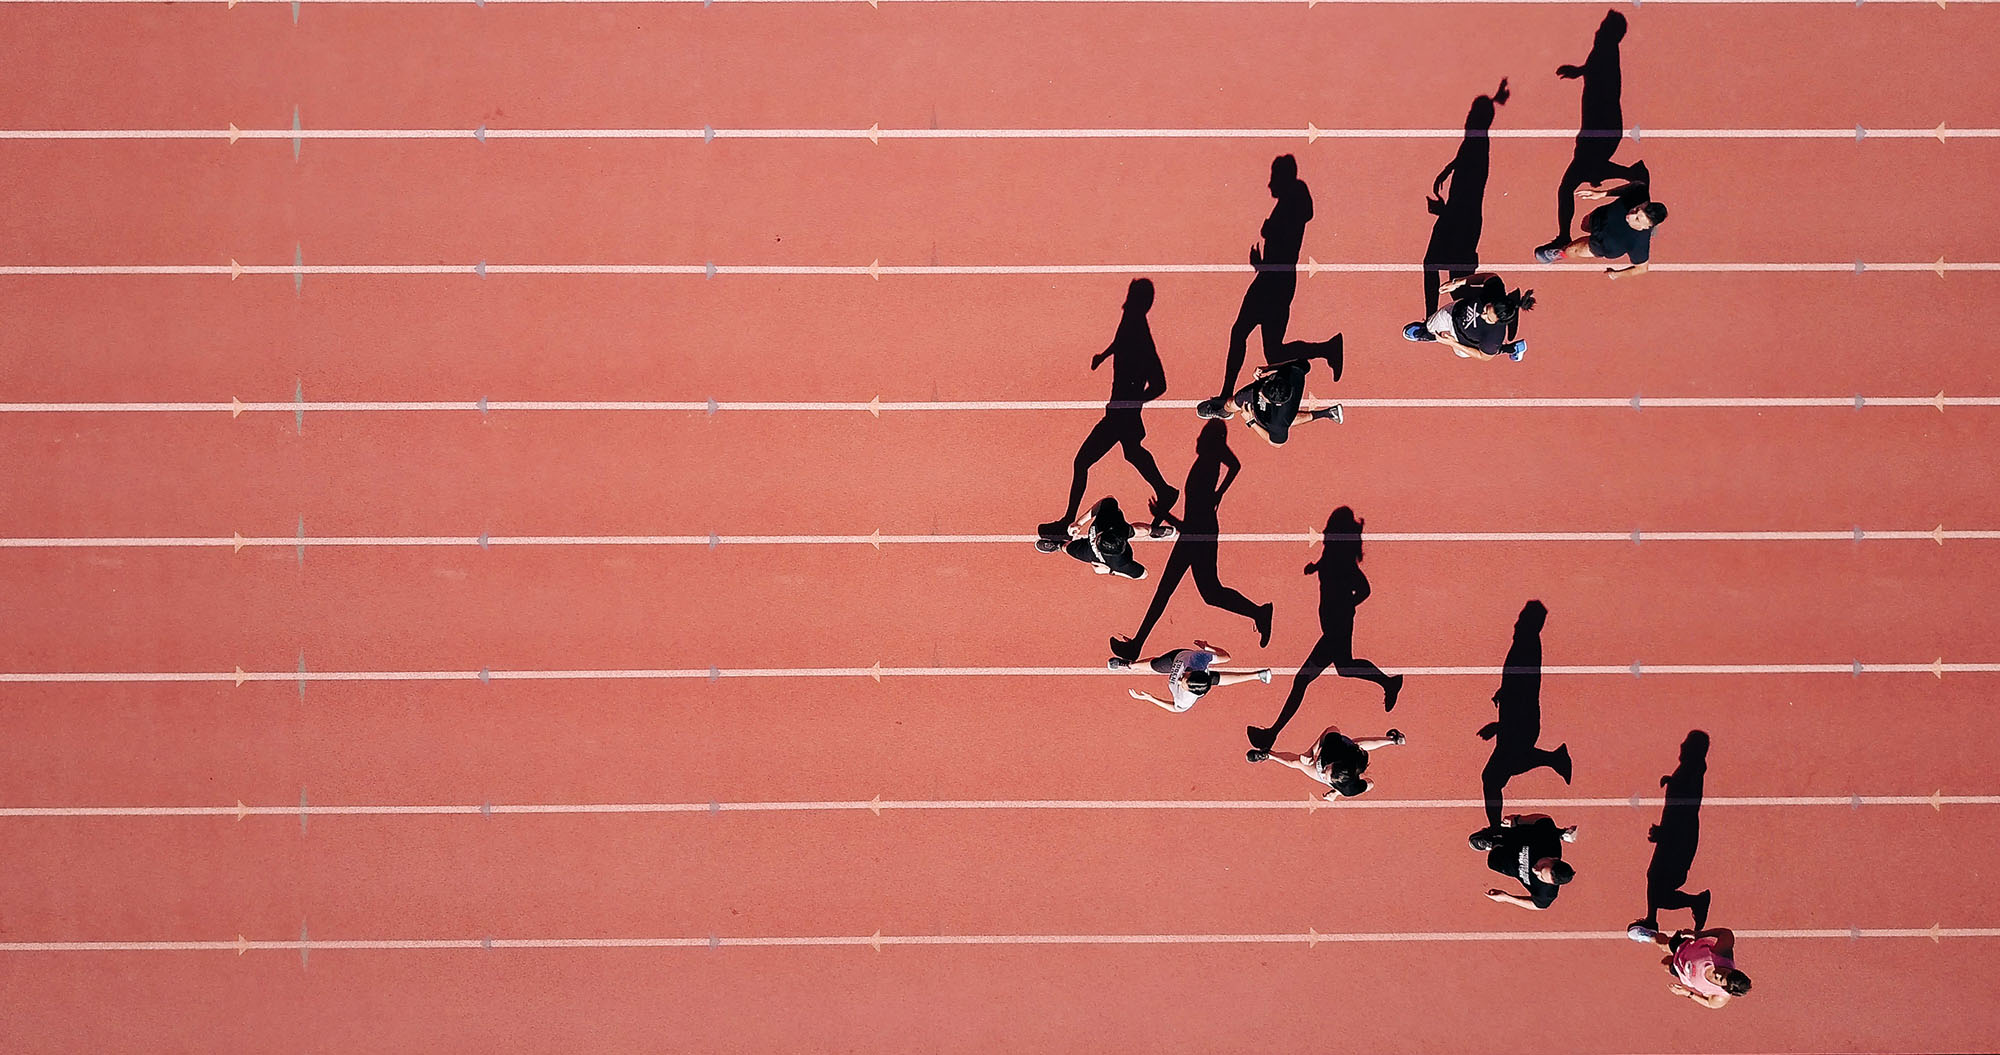 Photo of athletes running in stadium